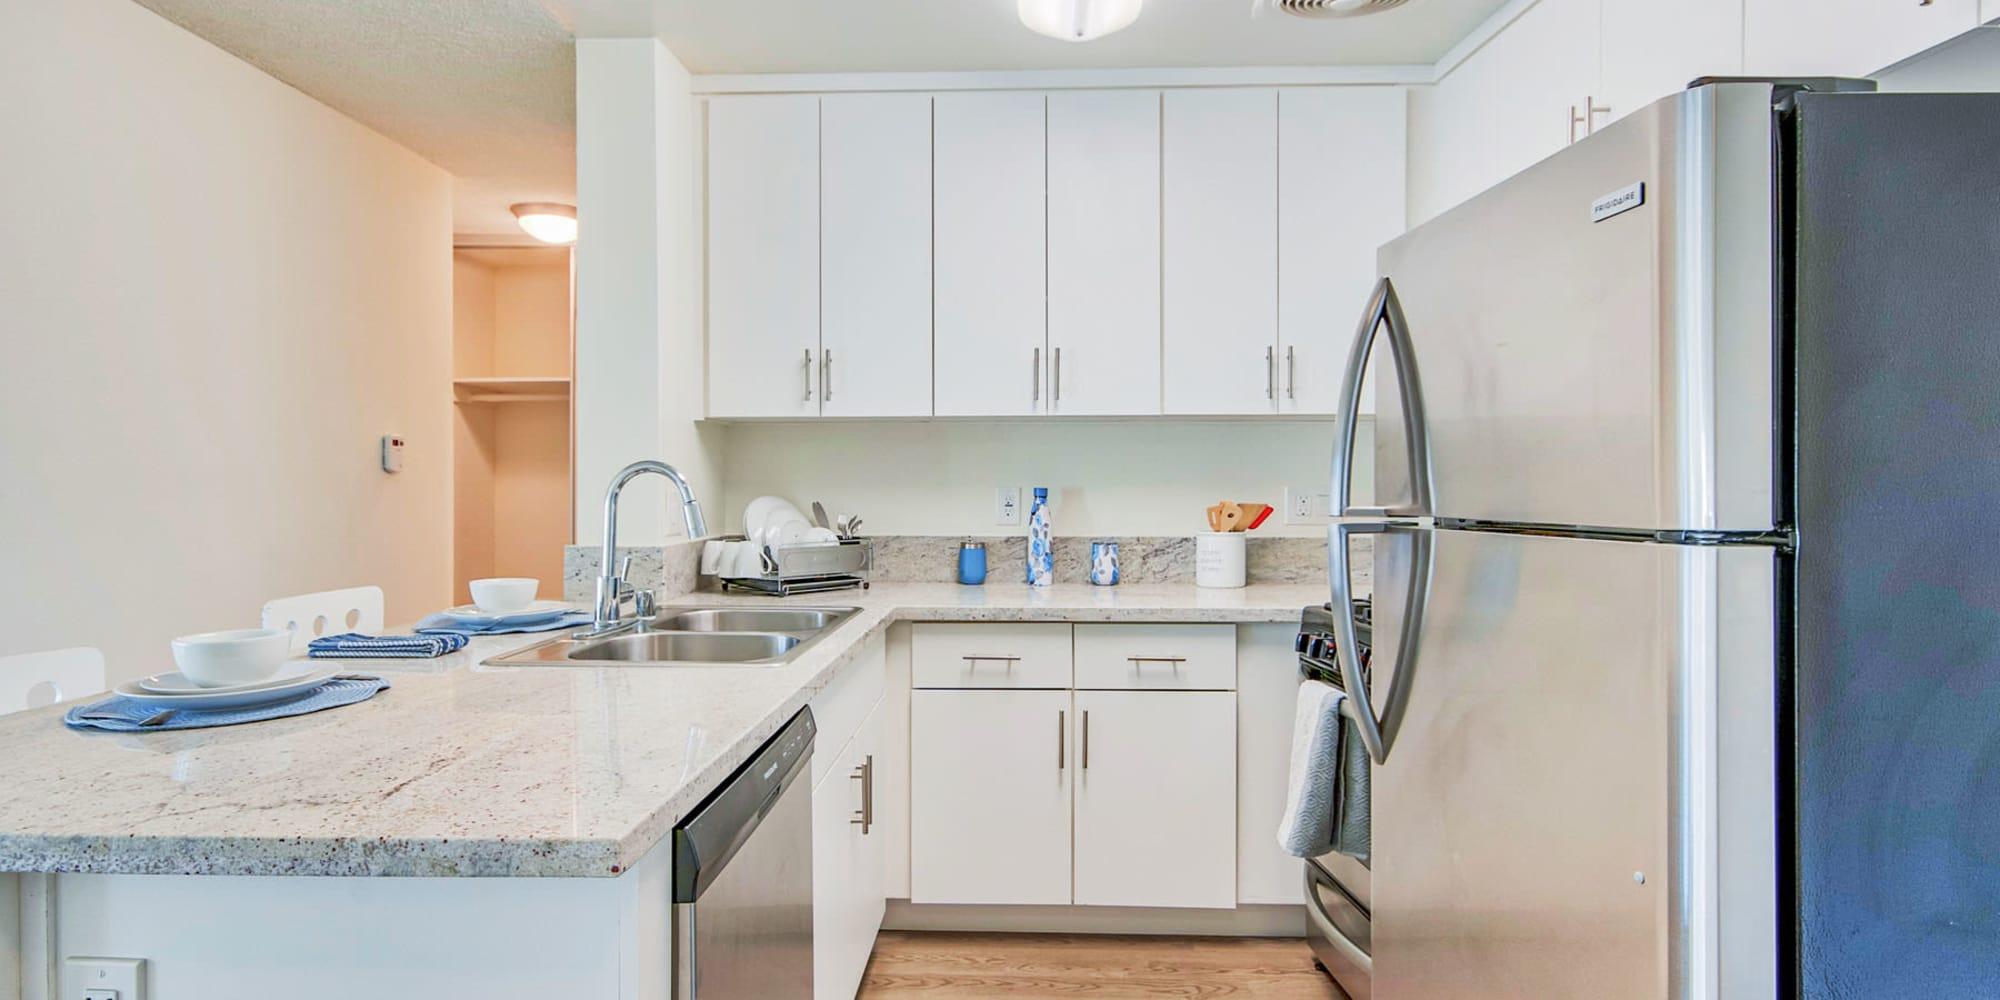 Bright white cabinetry and granite countertops in a model home's kitchen at Villa Vicente in Los Angeles, California